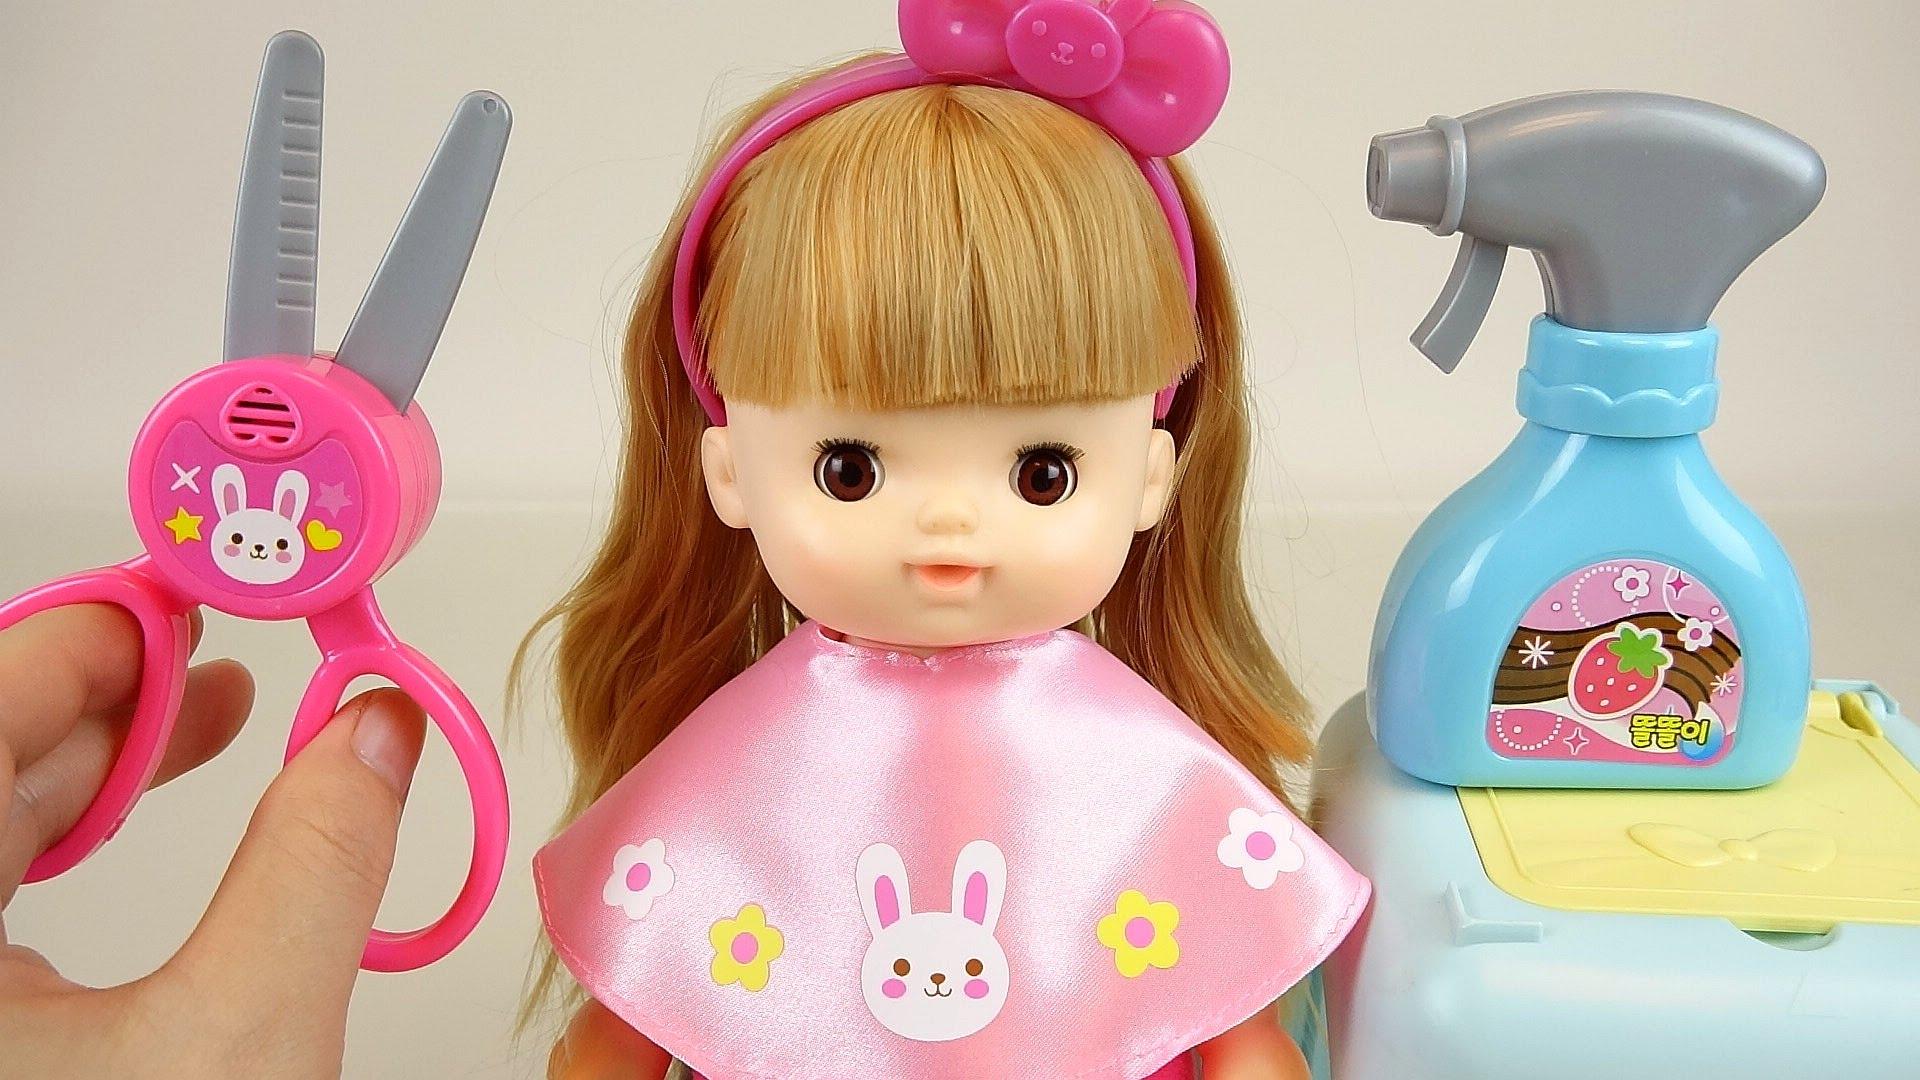 Baby doll photo